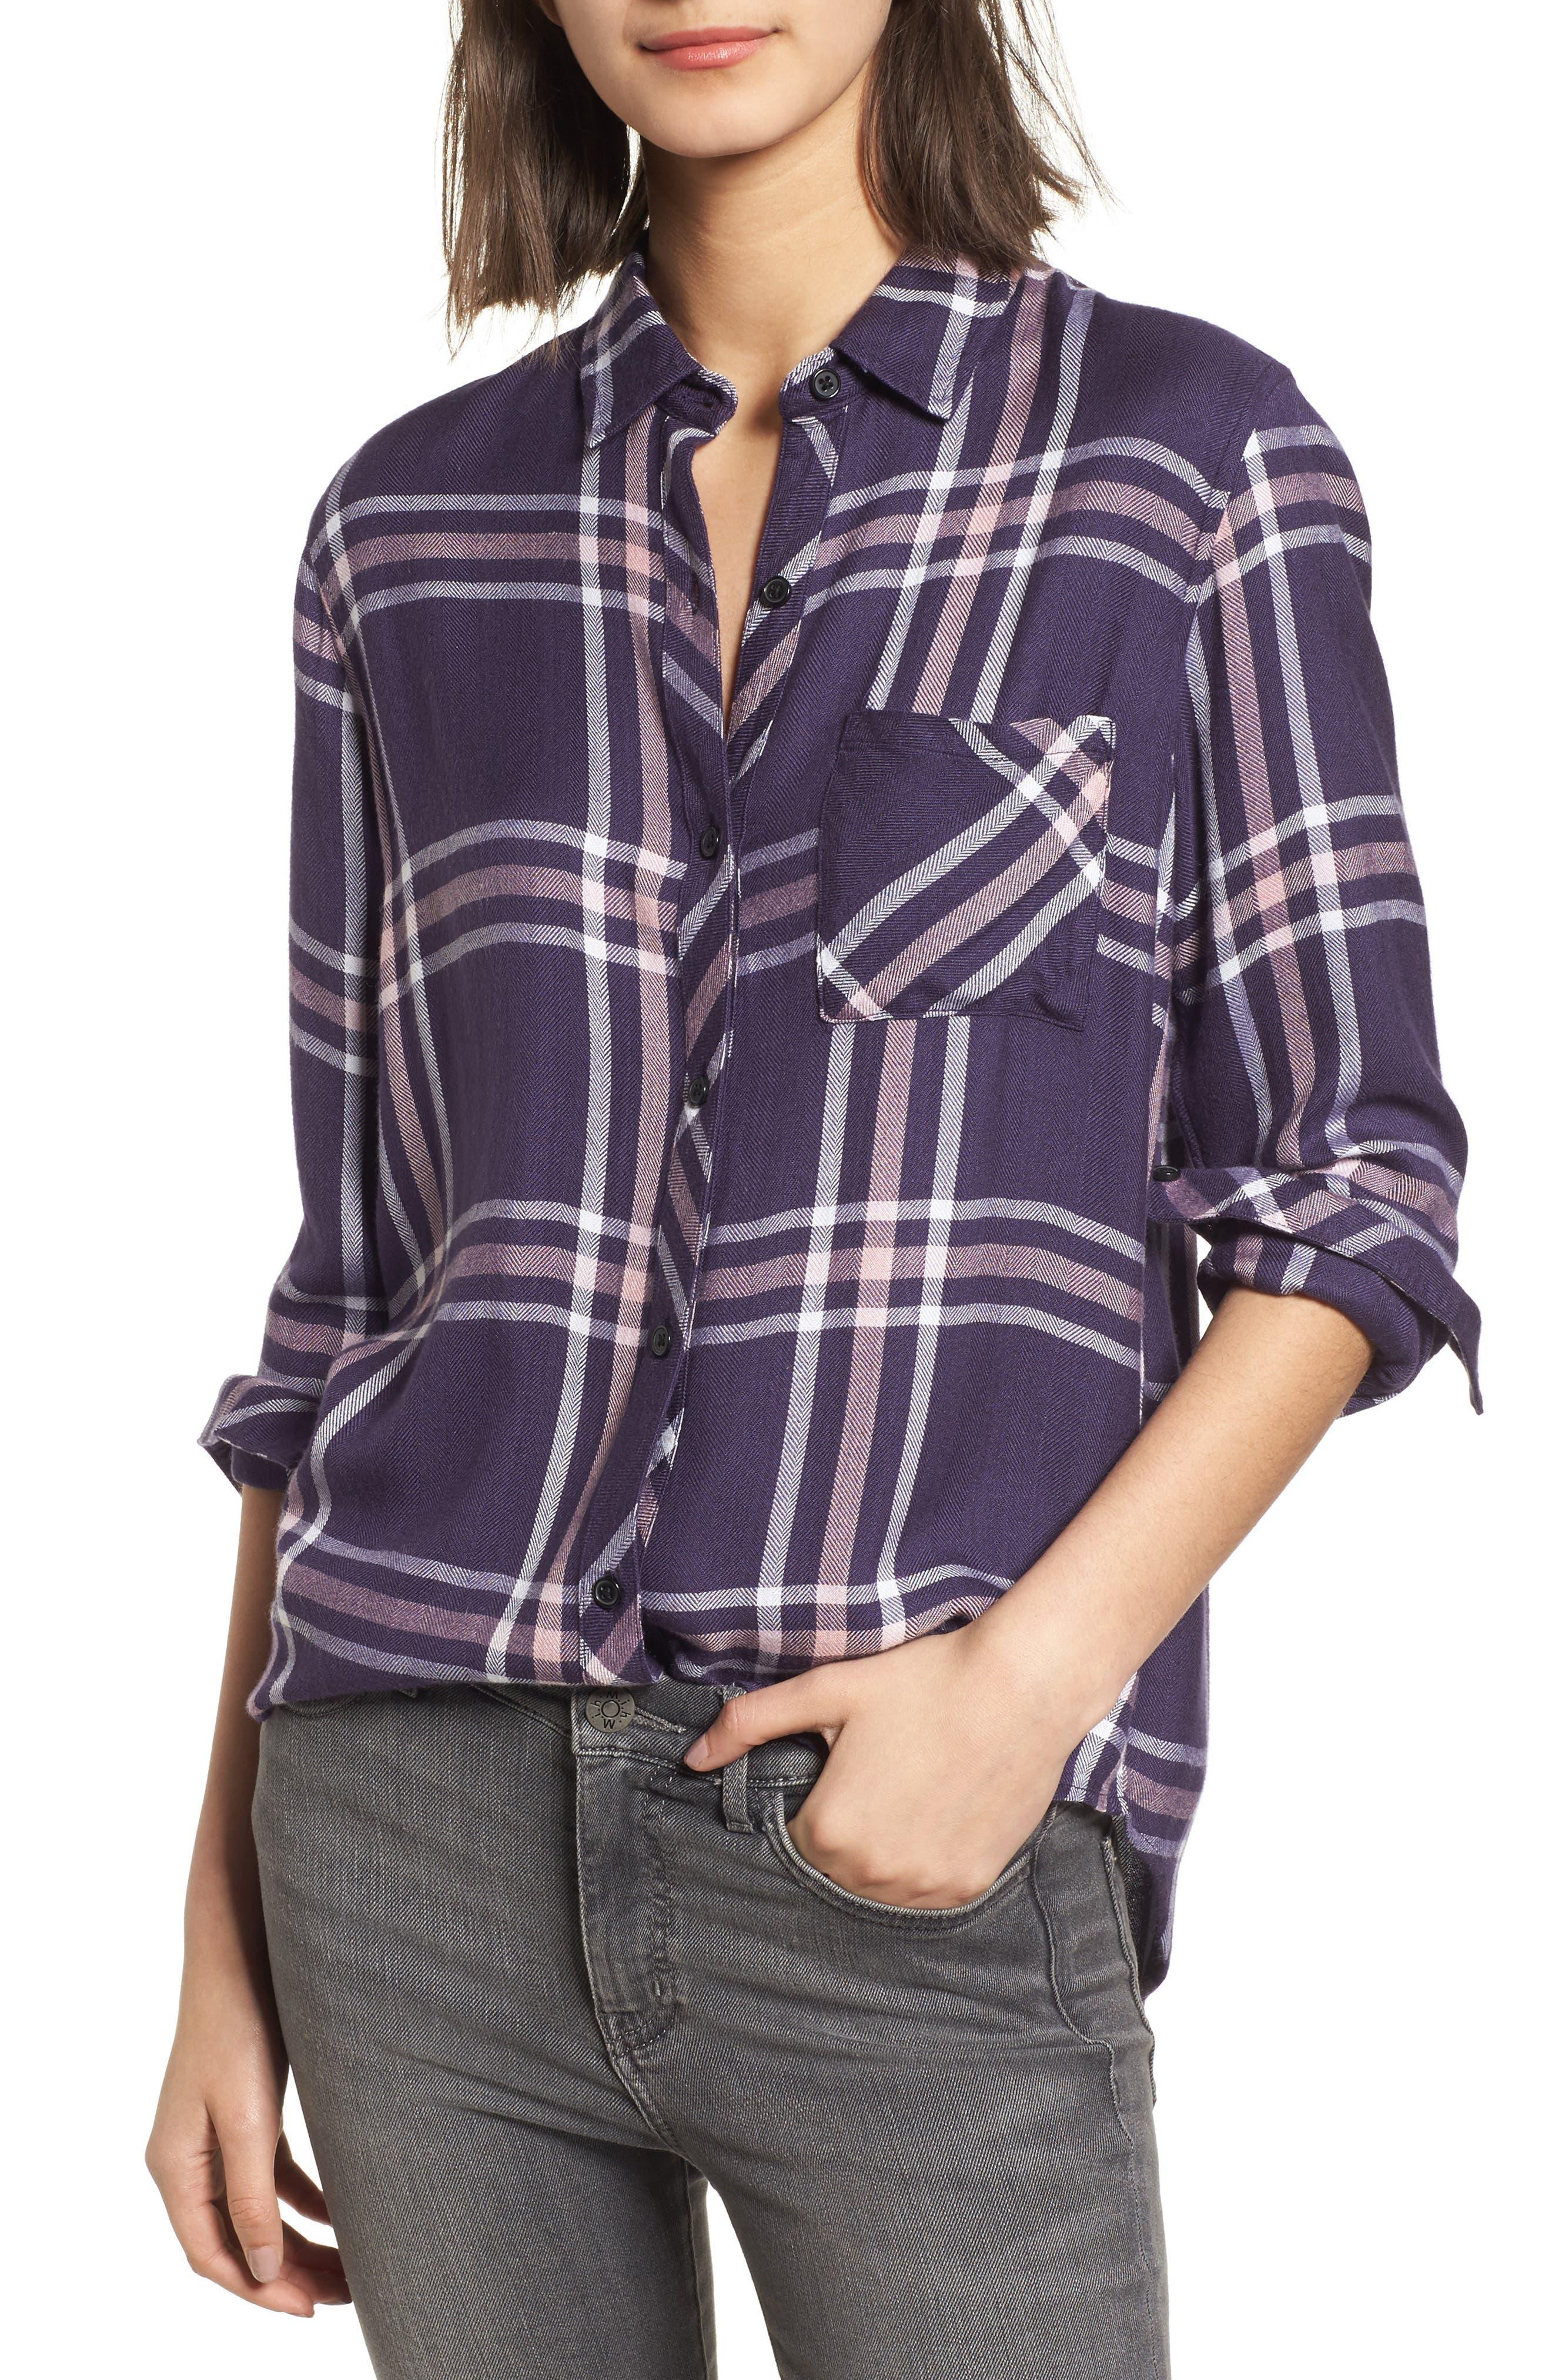 Sale alerts for  Hunter Plaid Shirt - Covvet